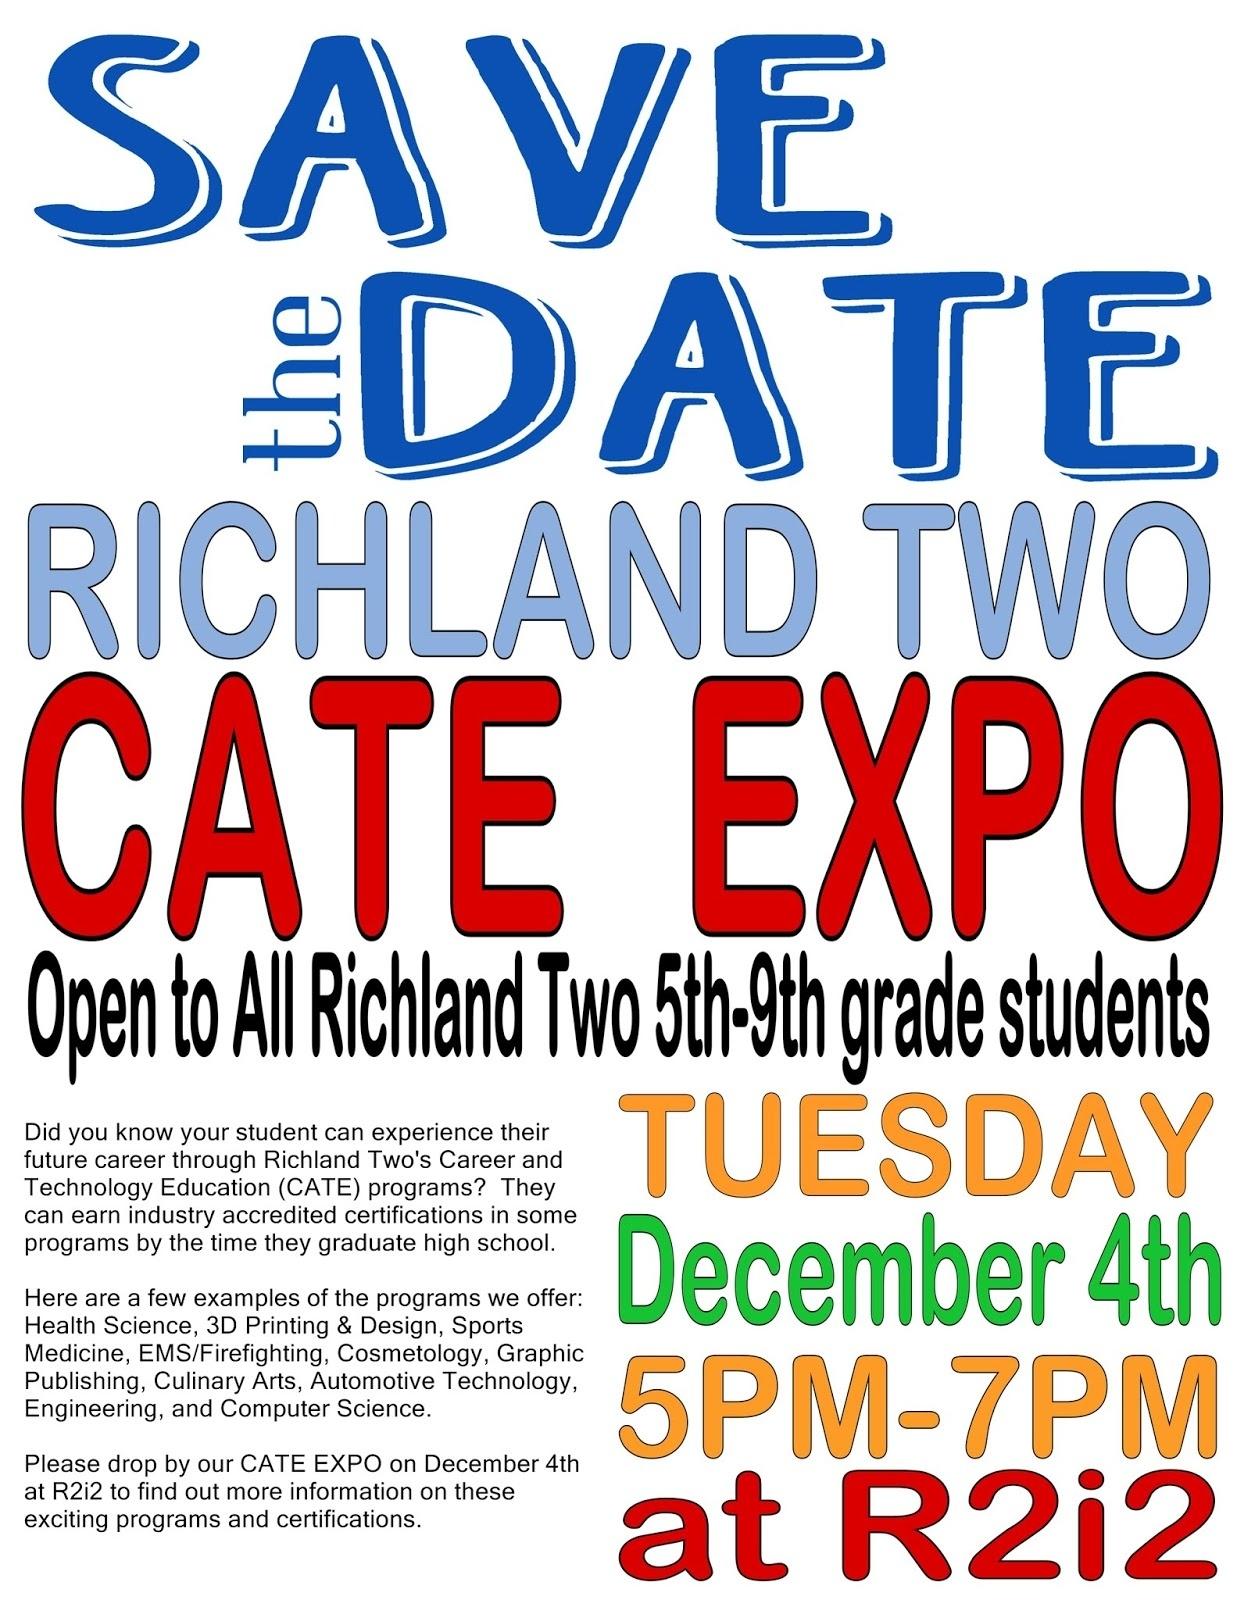 Lake Carolina Elementary Communigator: Richland 2 Cate Expo_Richland 2 School Calendar